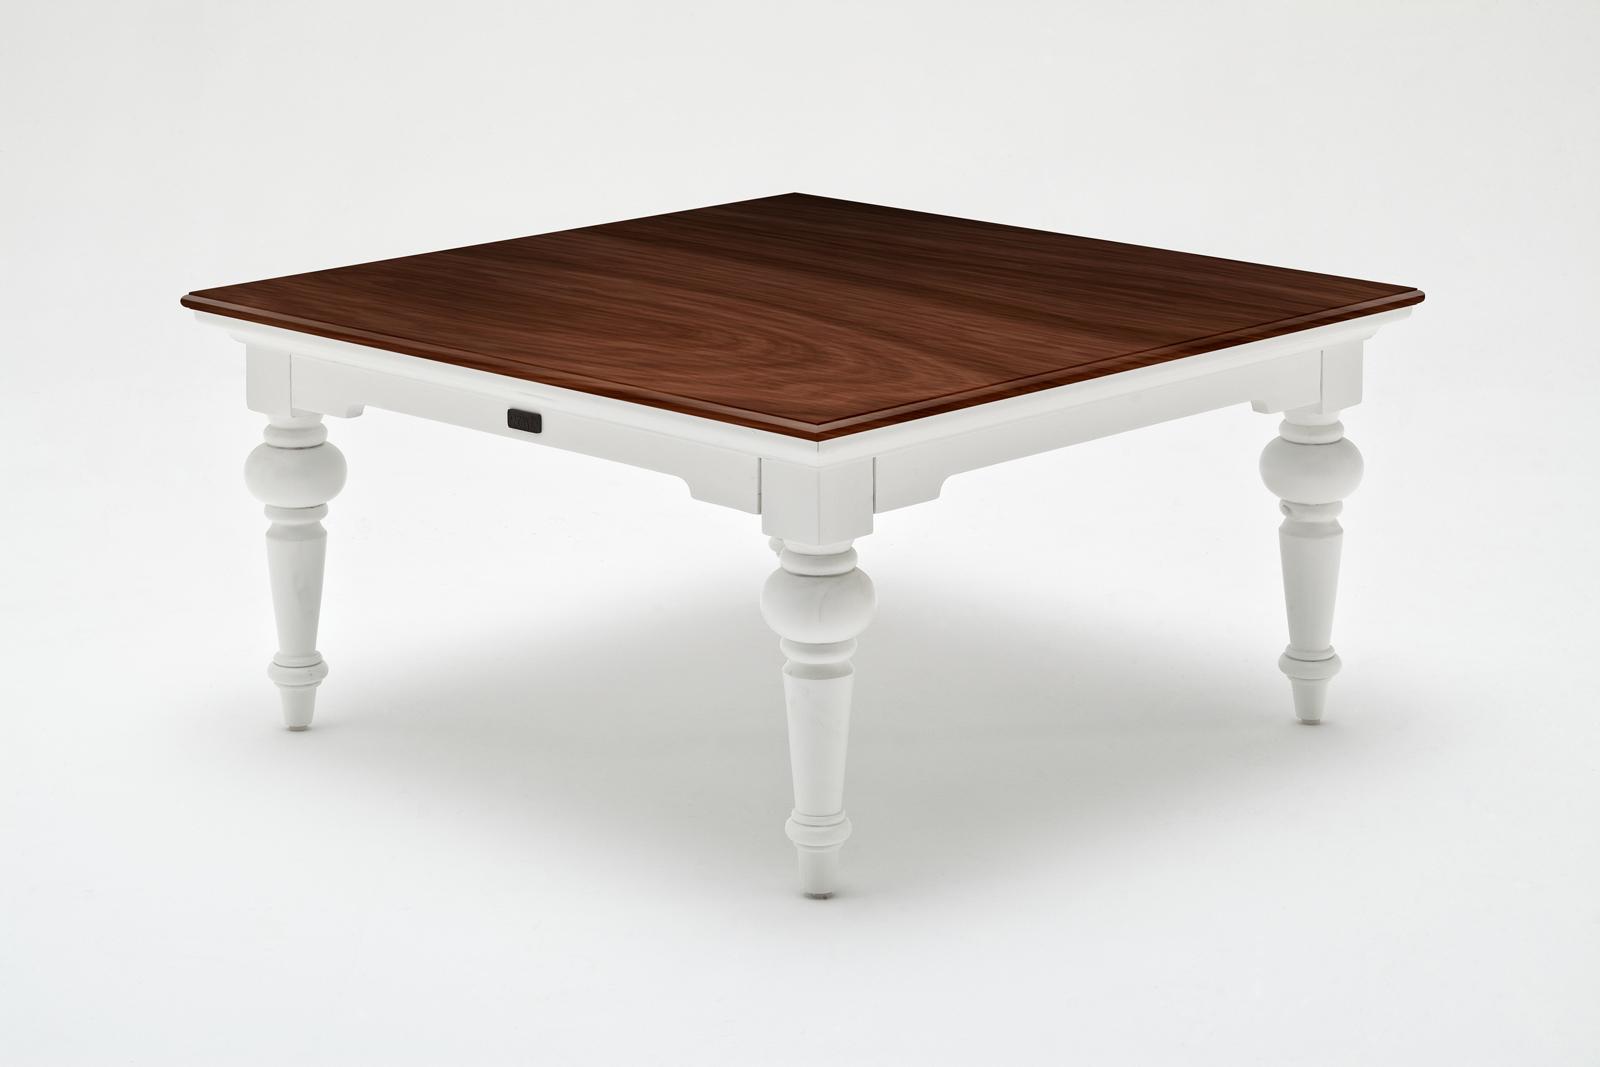 Table Basse Carree En Bois Blanc Avec Plateau Acajou